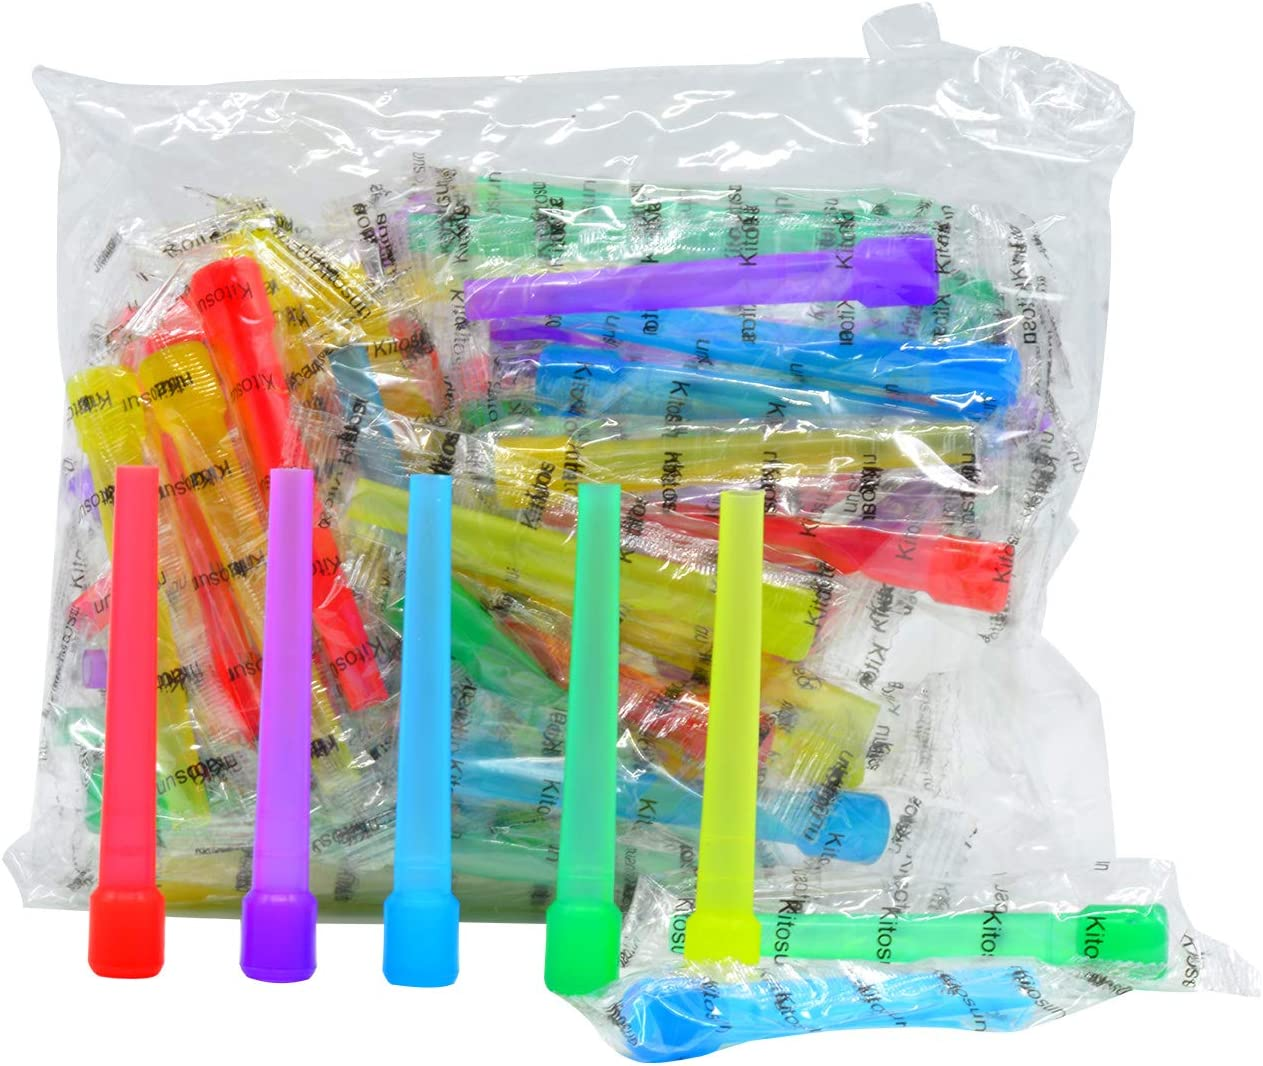 Hookah Choice Tips Disposable Mouth Choice BPA-Free Plastic